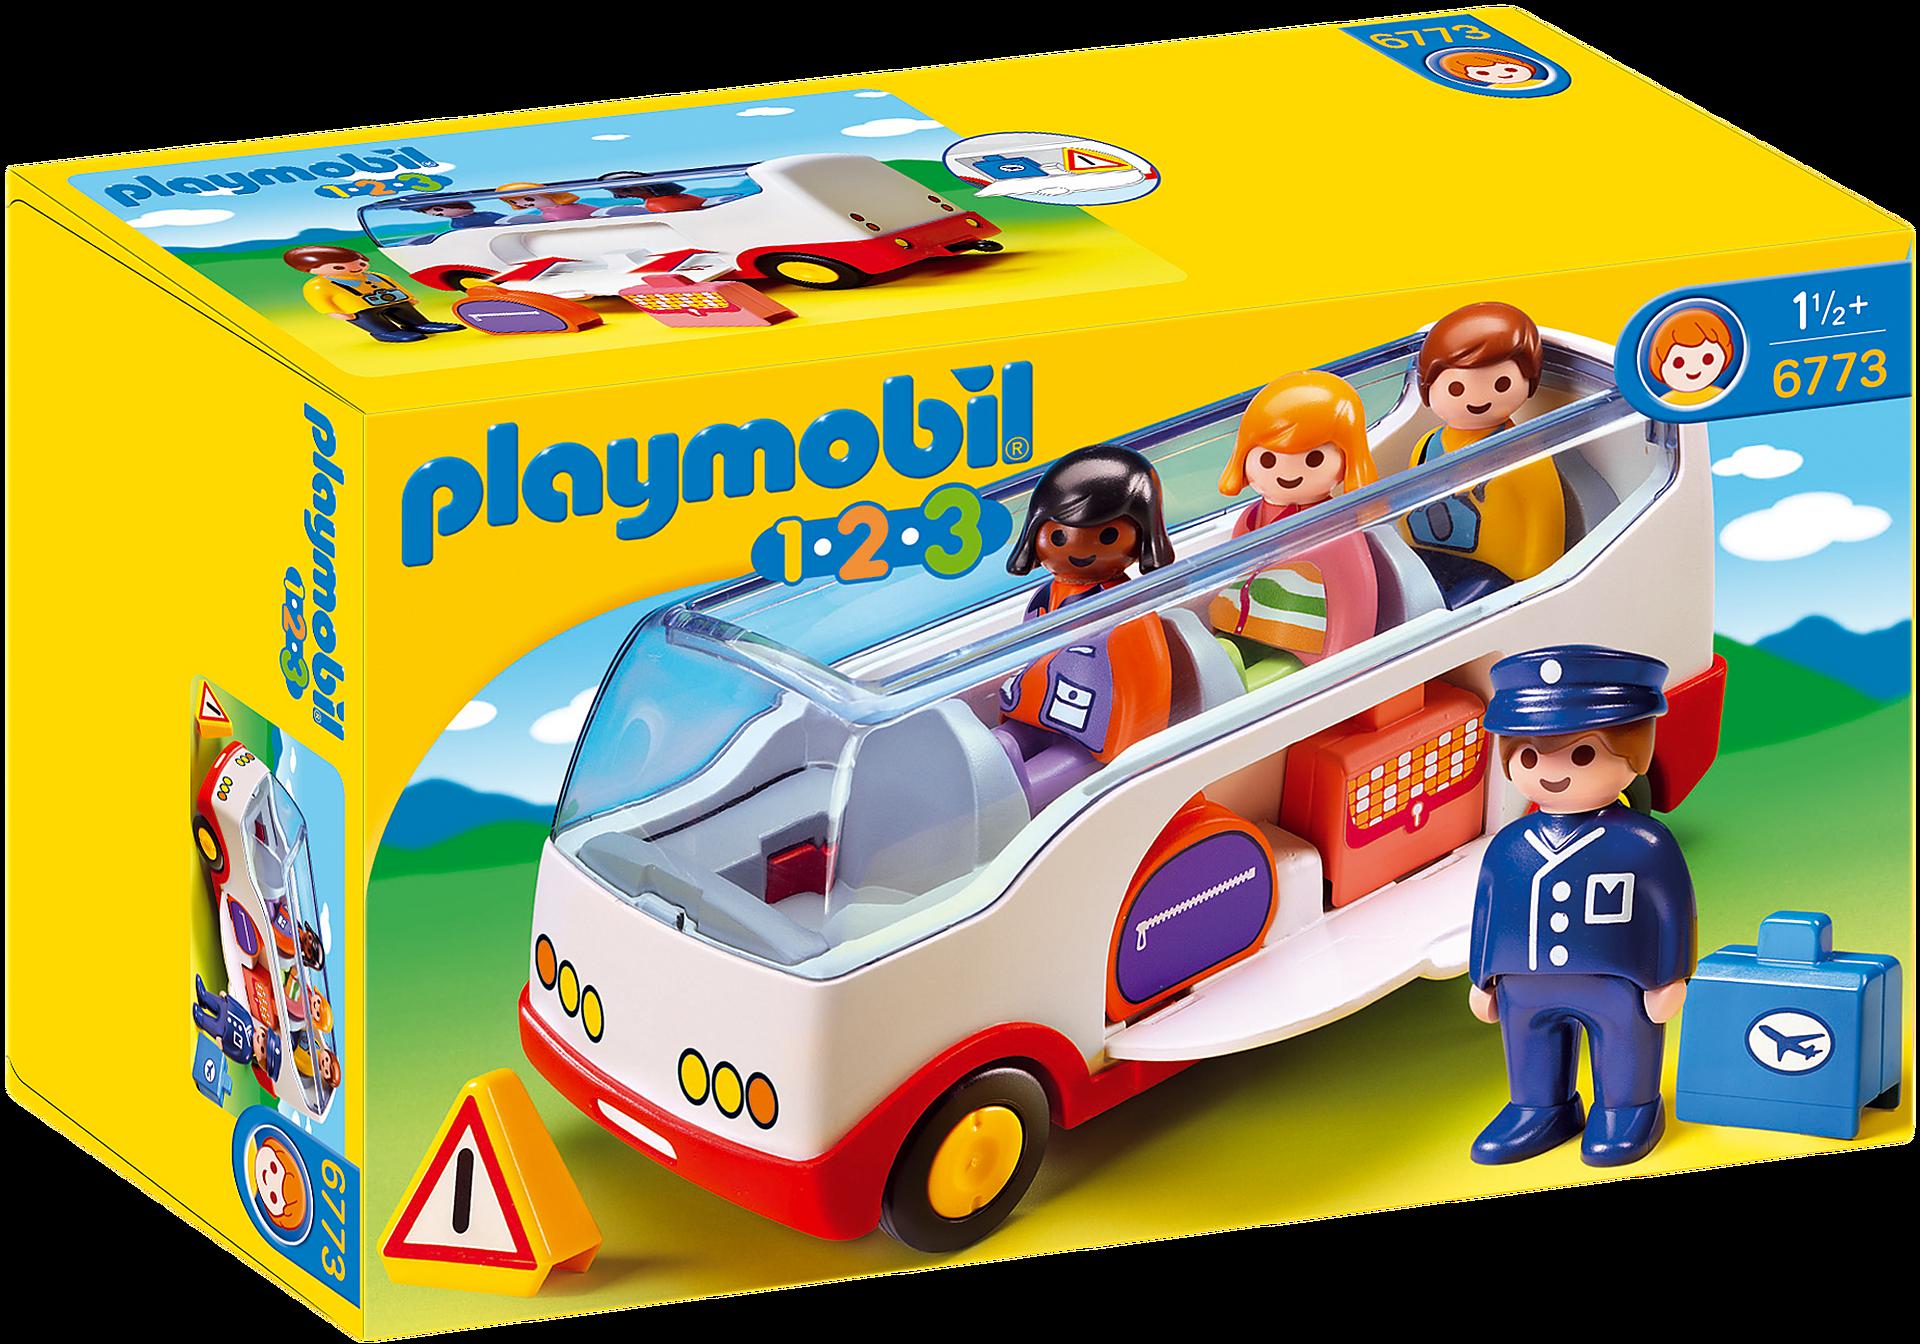 http://media.playmobil.com/i/playmobil/6773_product_box_front/1.2.3 Airport Shuttle Bus